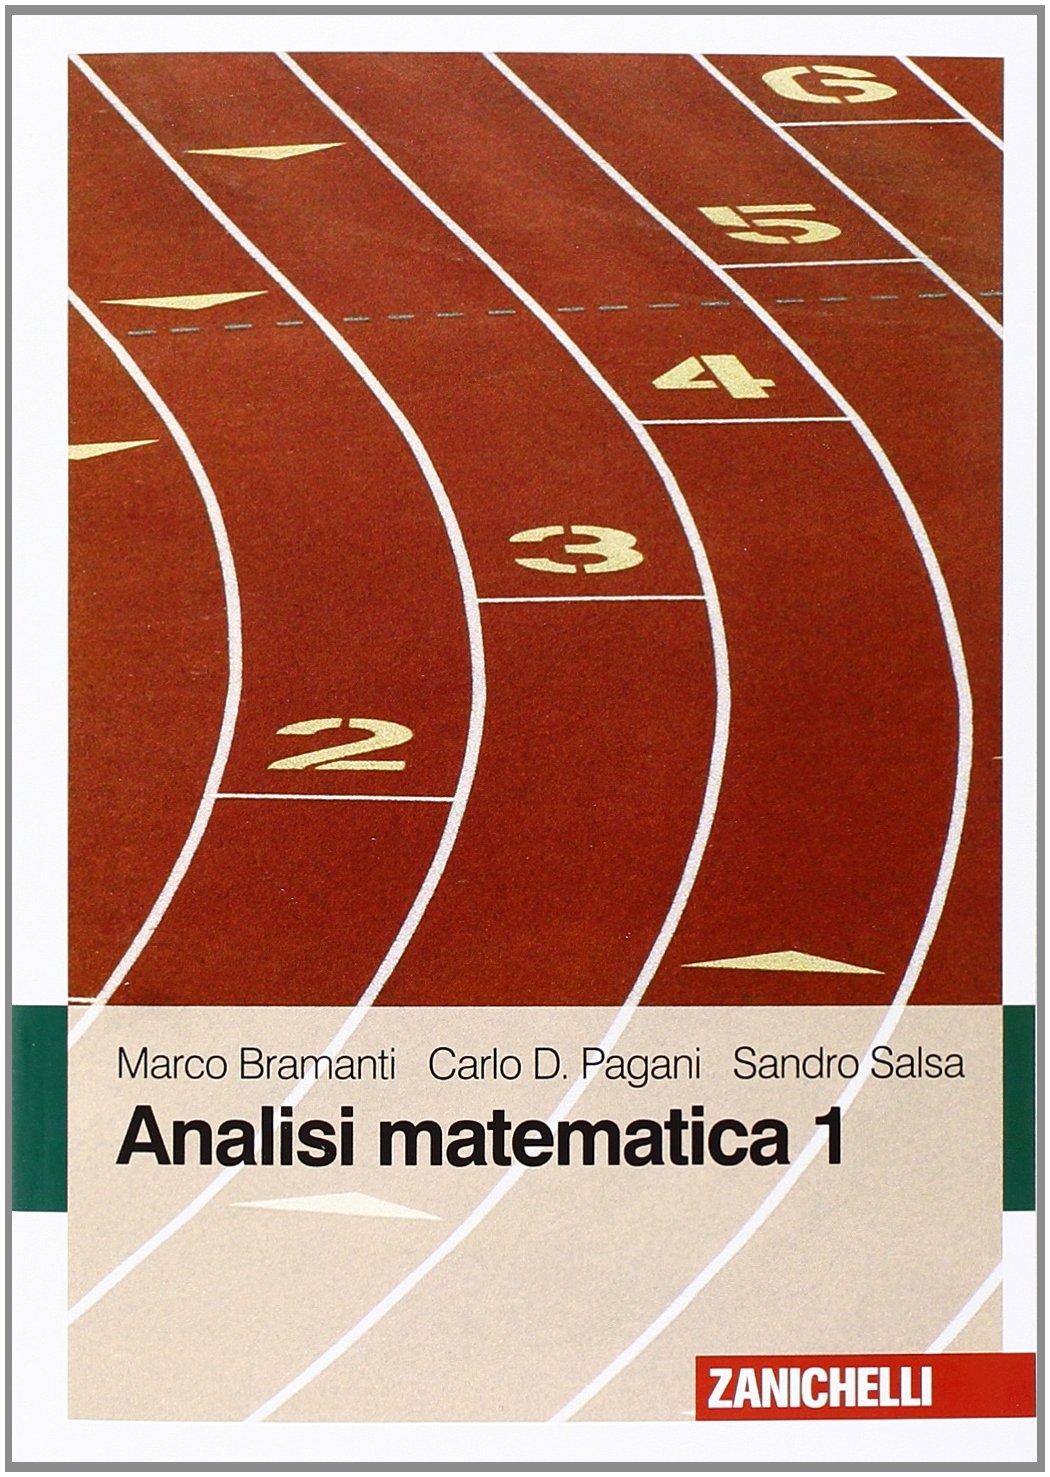 Analisi matematica 1: Amazon.it: Marco Bramanti, Carlo D. Pagani, Sandro  Salsa: Libri